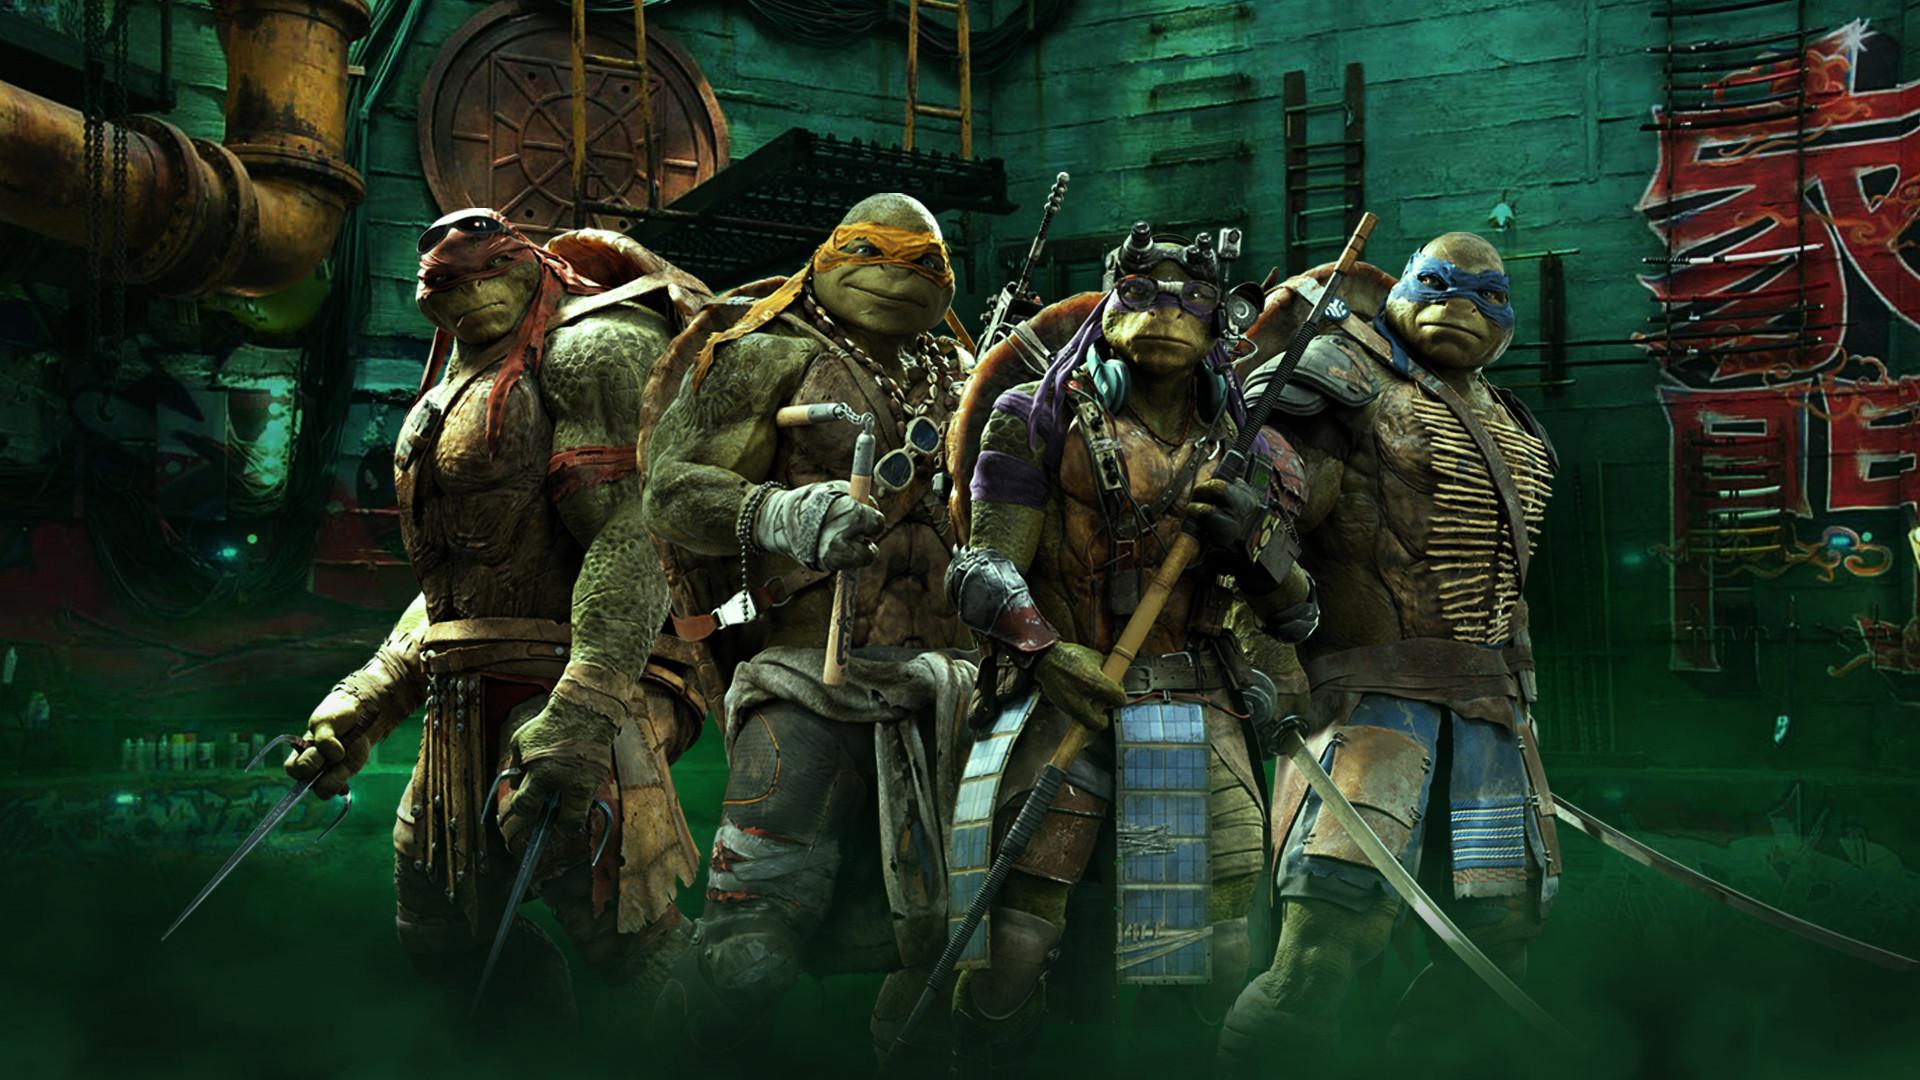 1080×1920 Wallpaper teenage mutant ninja turtles, raphael, michelangelo,  leonardo, donatello   Wallpapers HD   Pinterest   Teenage mutant ninja  turtles, …